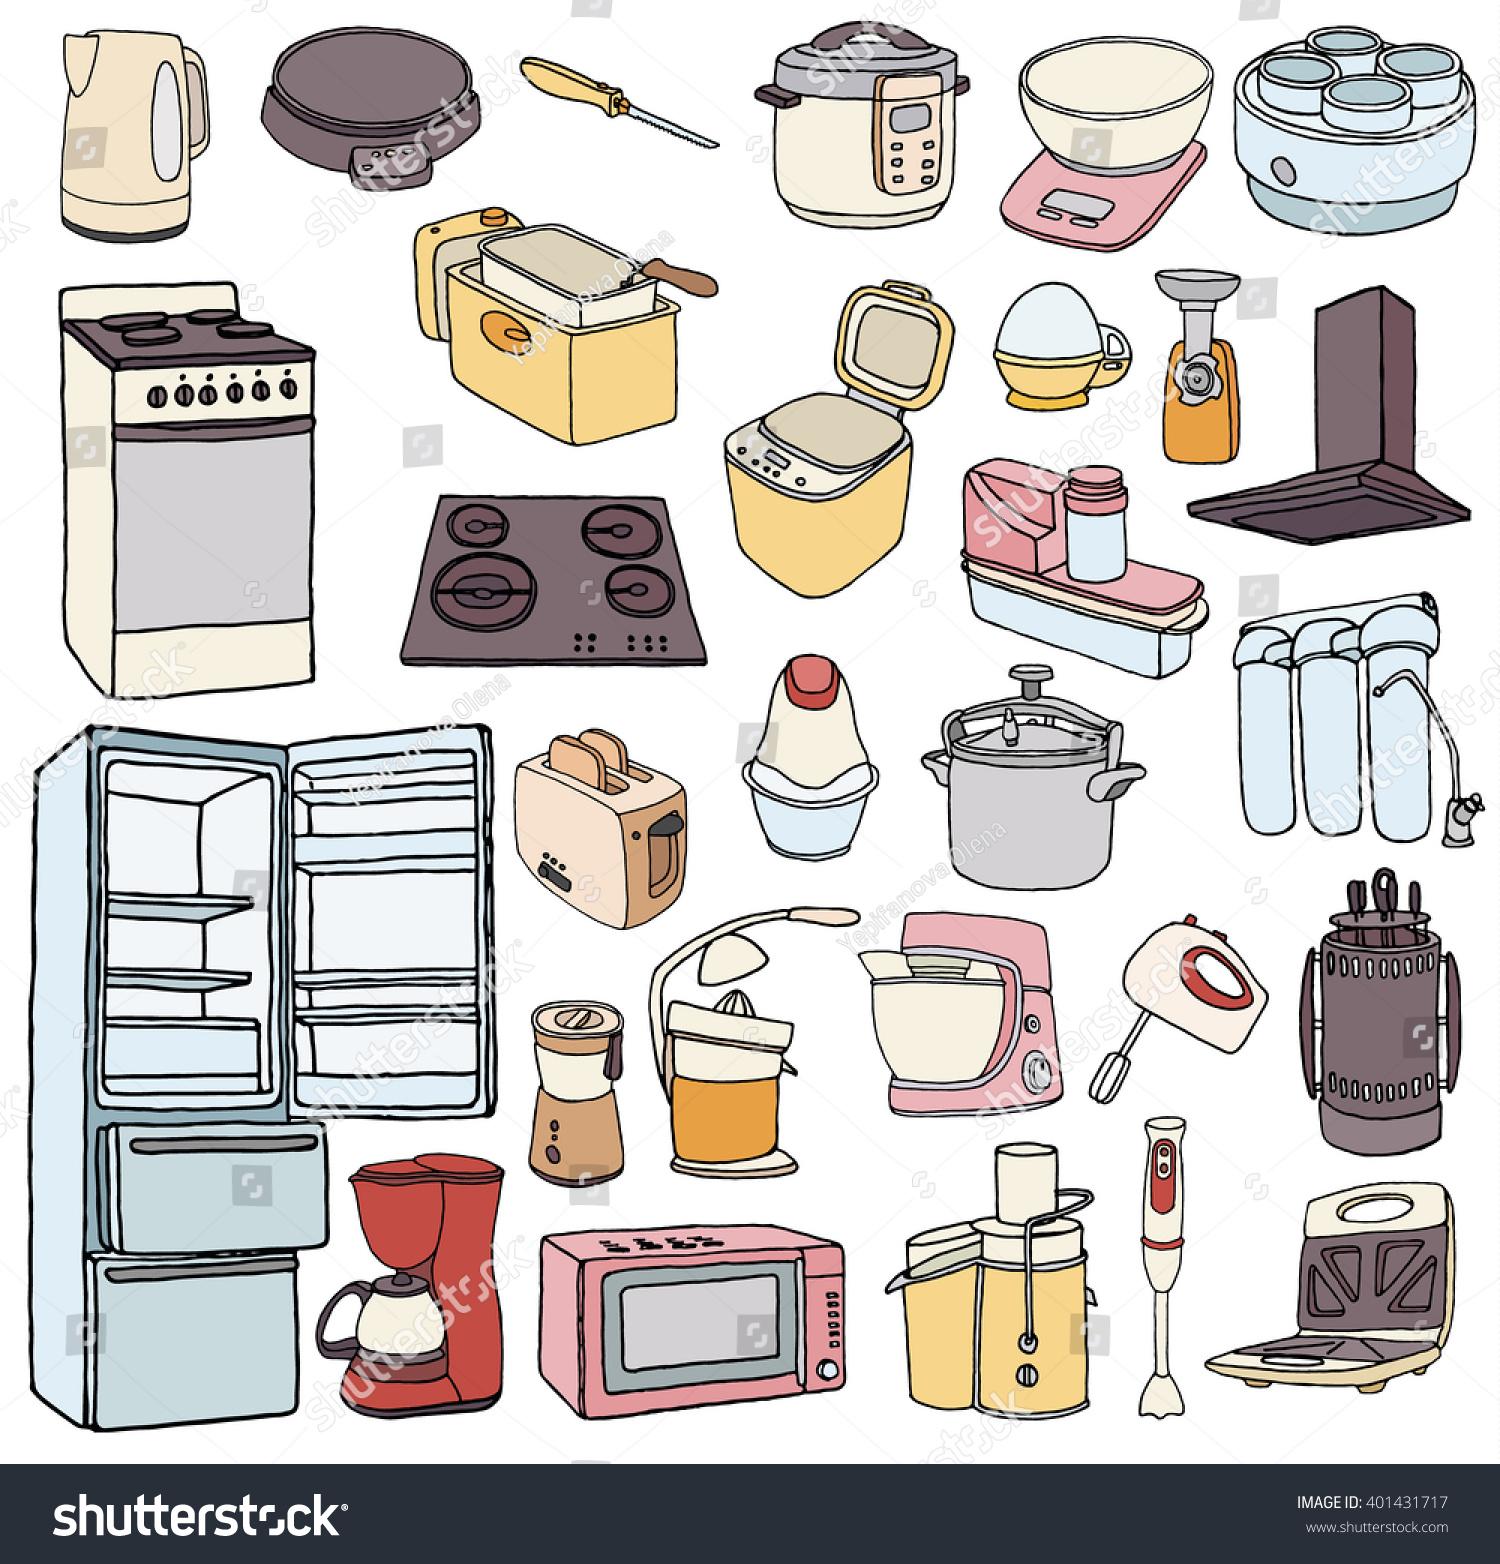 Kitchen Appliance Drawings ~ Kitchen appliances set doodle stock